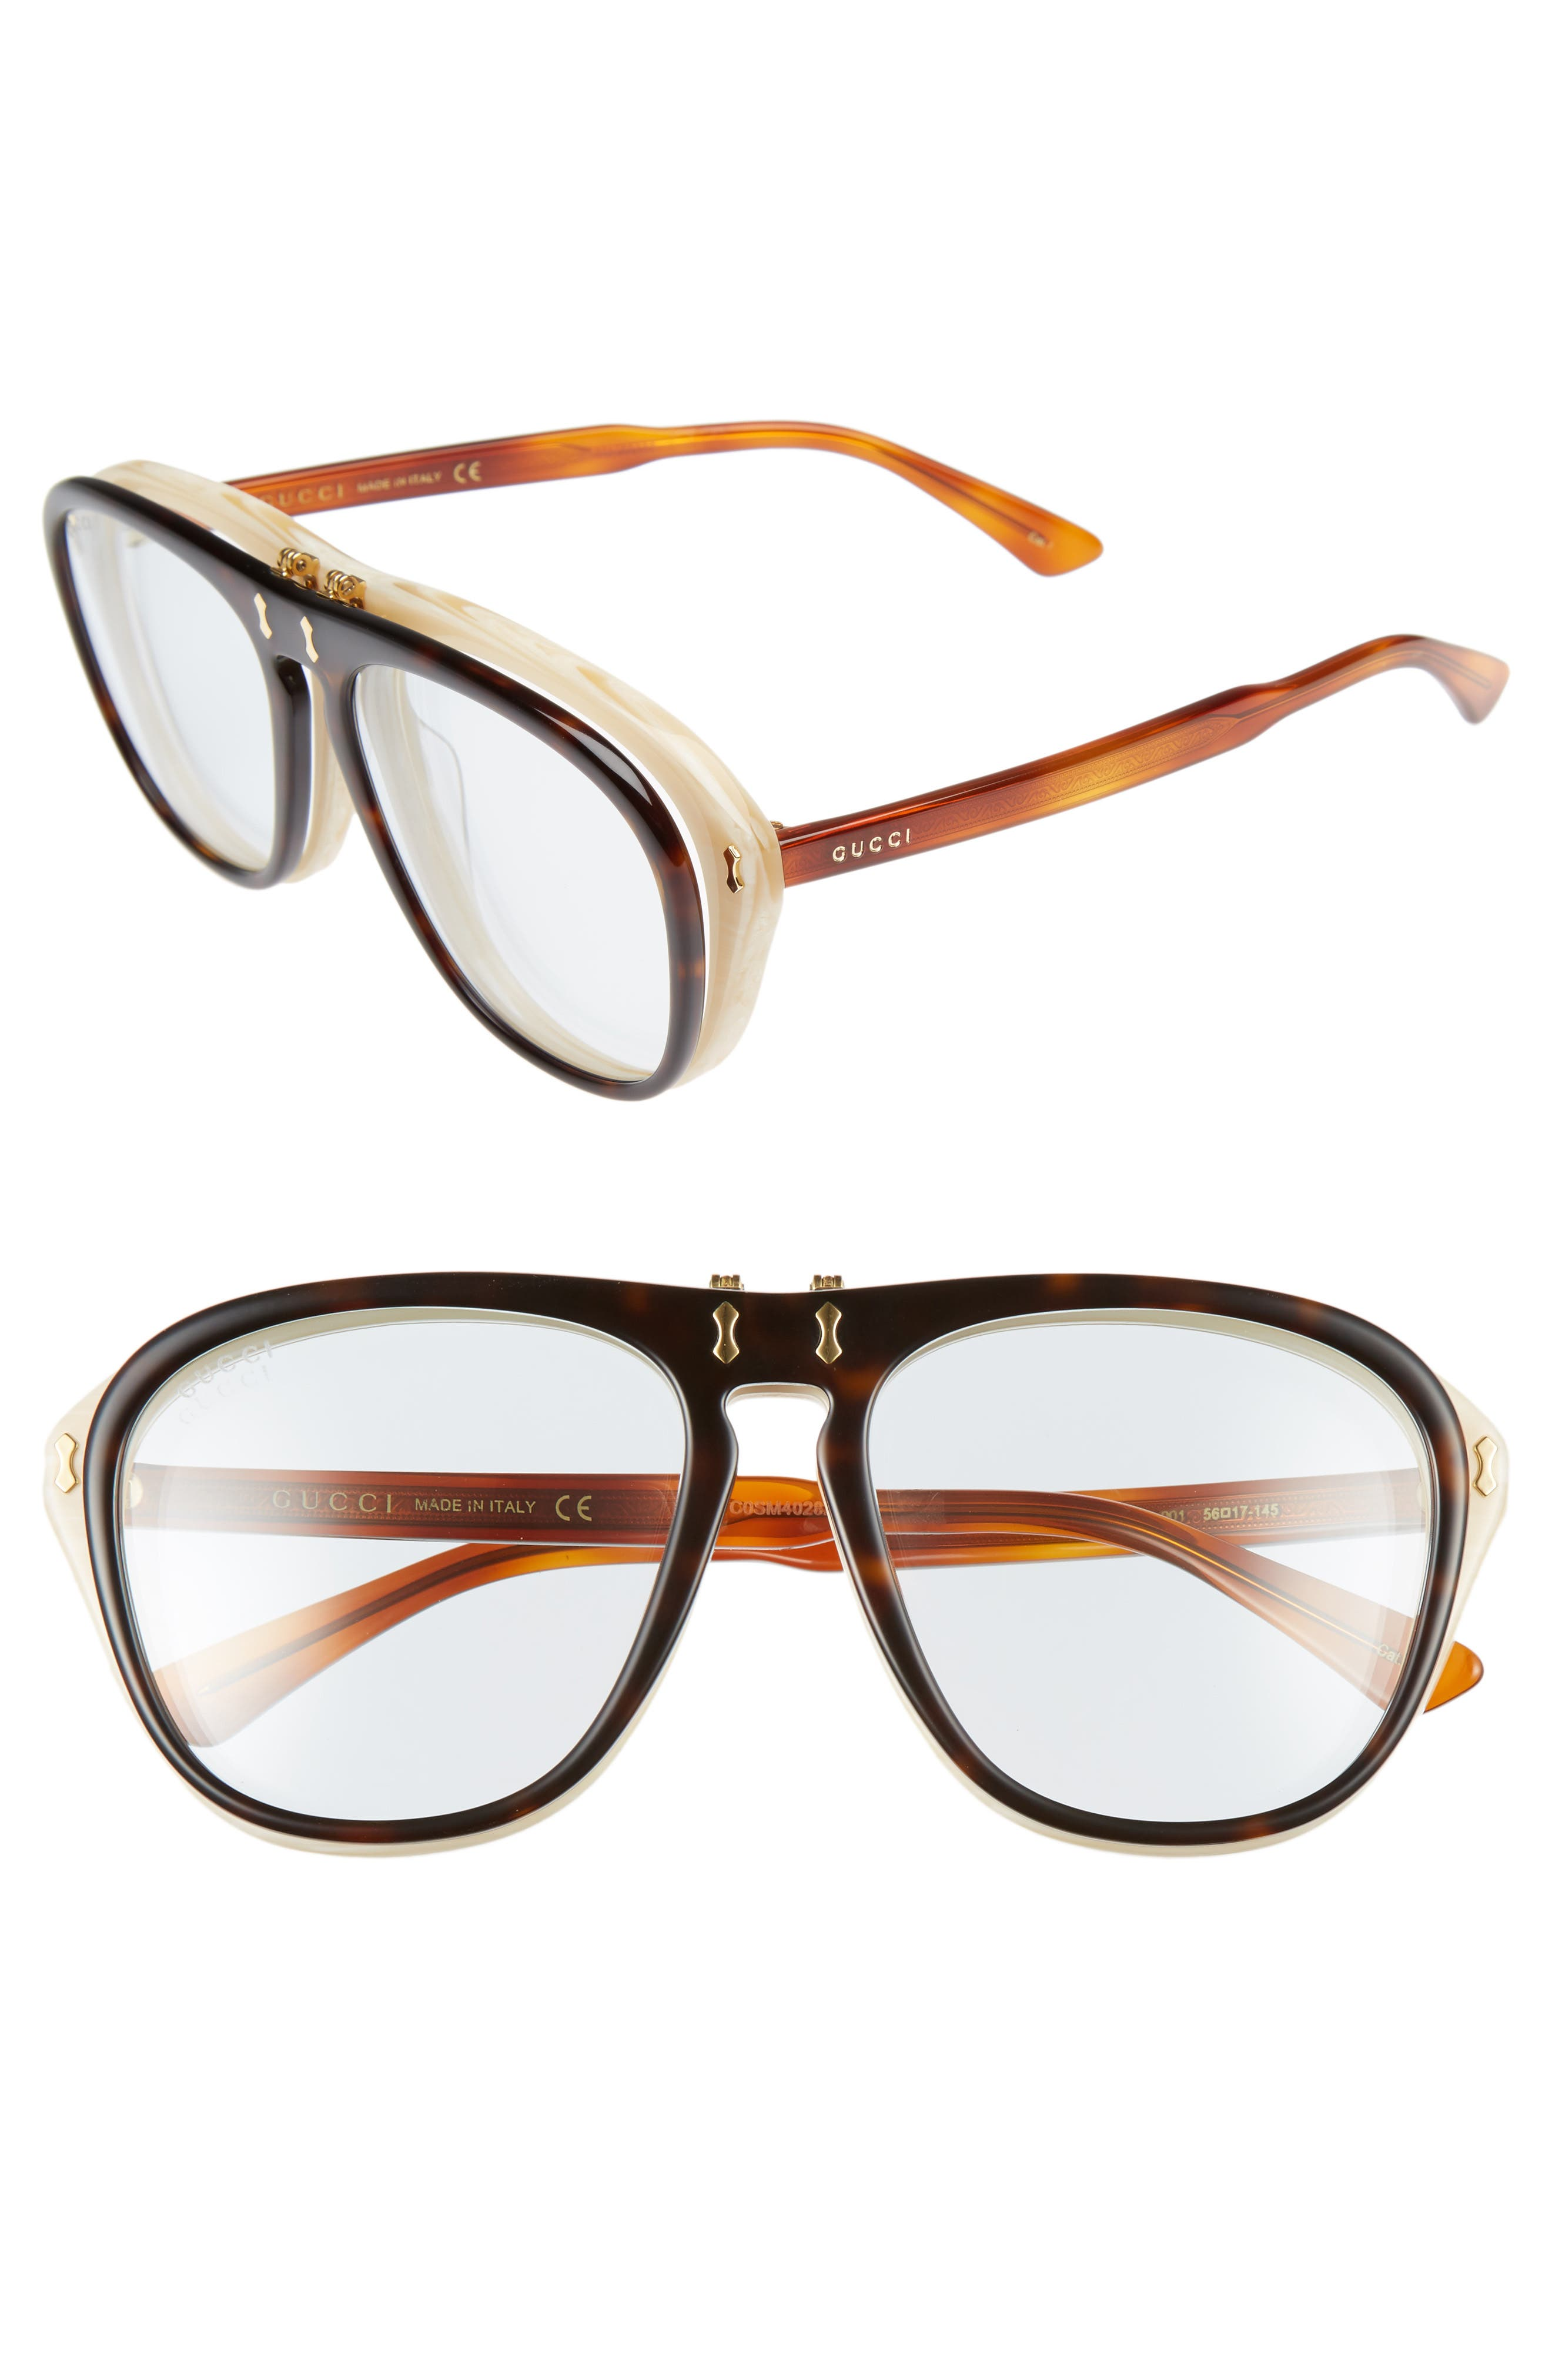 56mm Flip-Up Sunglasses,                         Main,                         color, 200